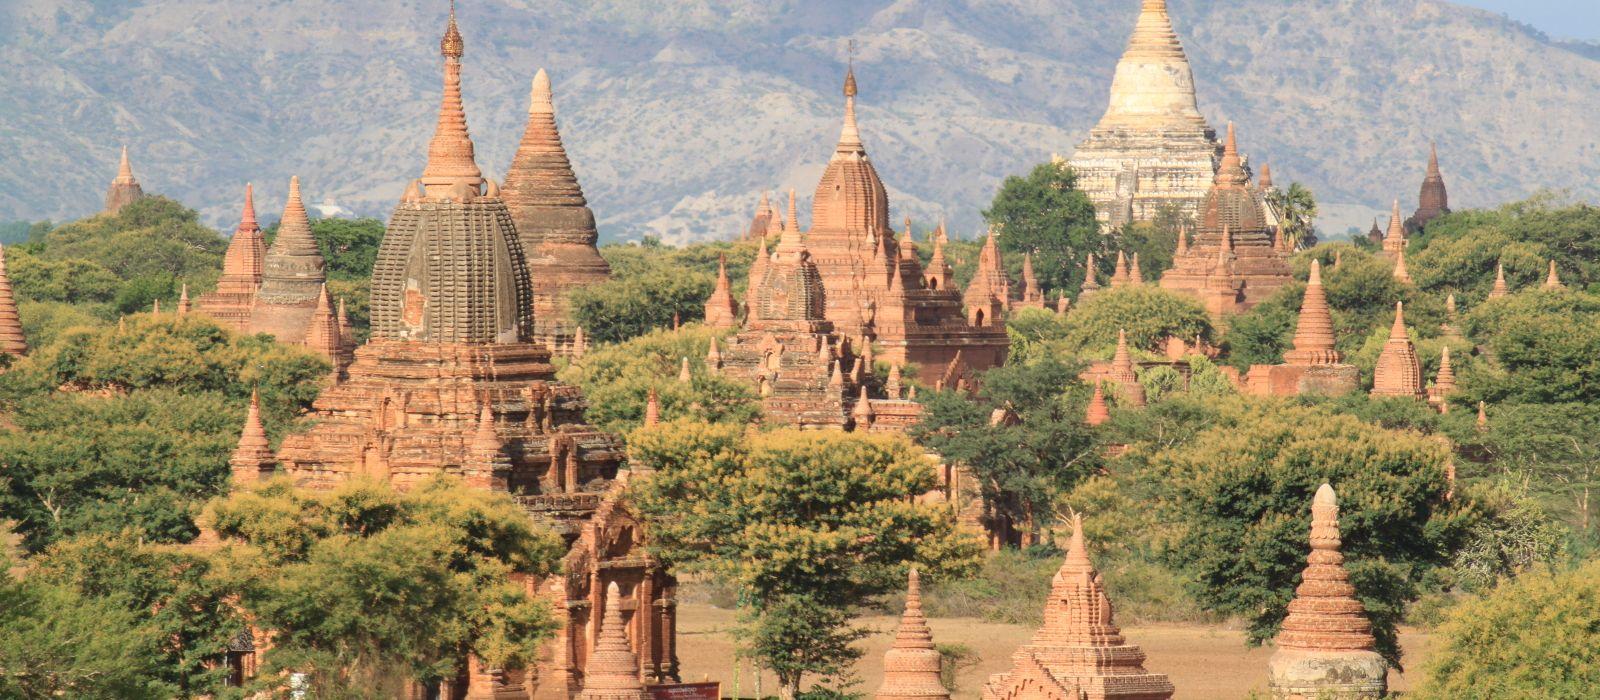 Destination Nyaung U Myanmar